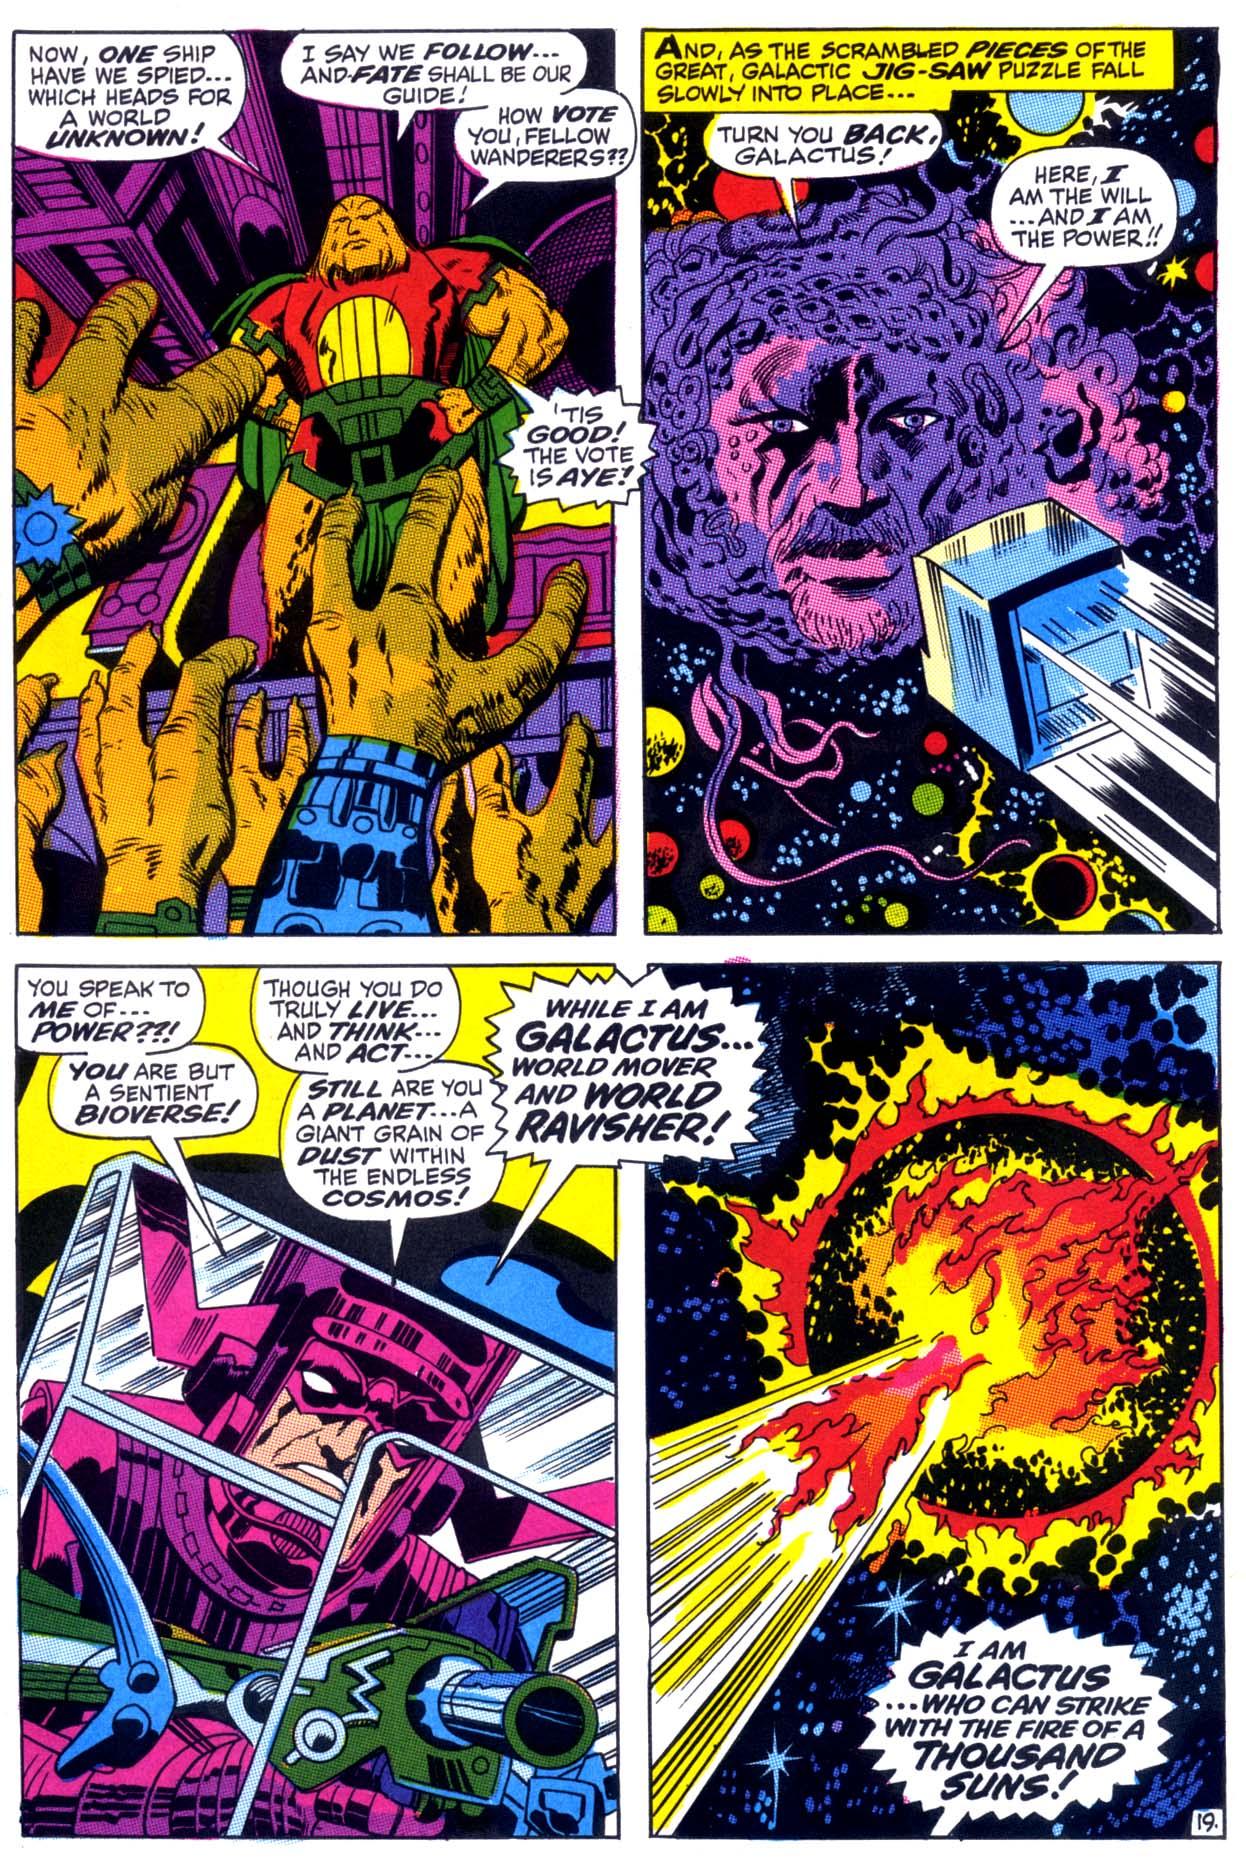 Can Galactus Eat Ego The Living Planet? | lowbrowcomics